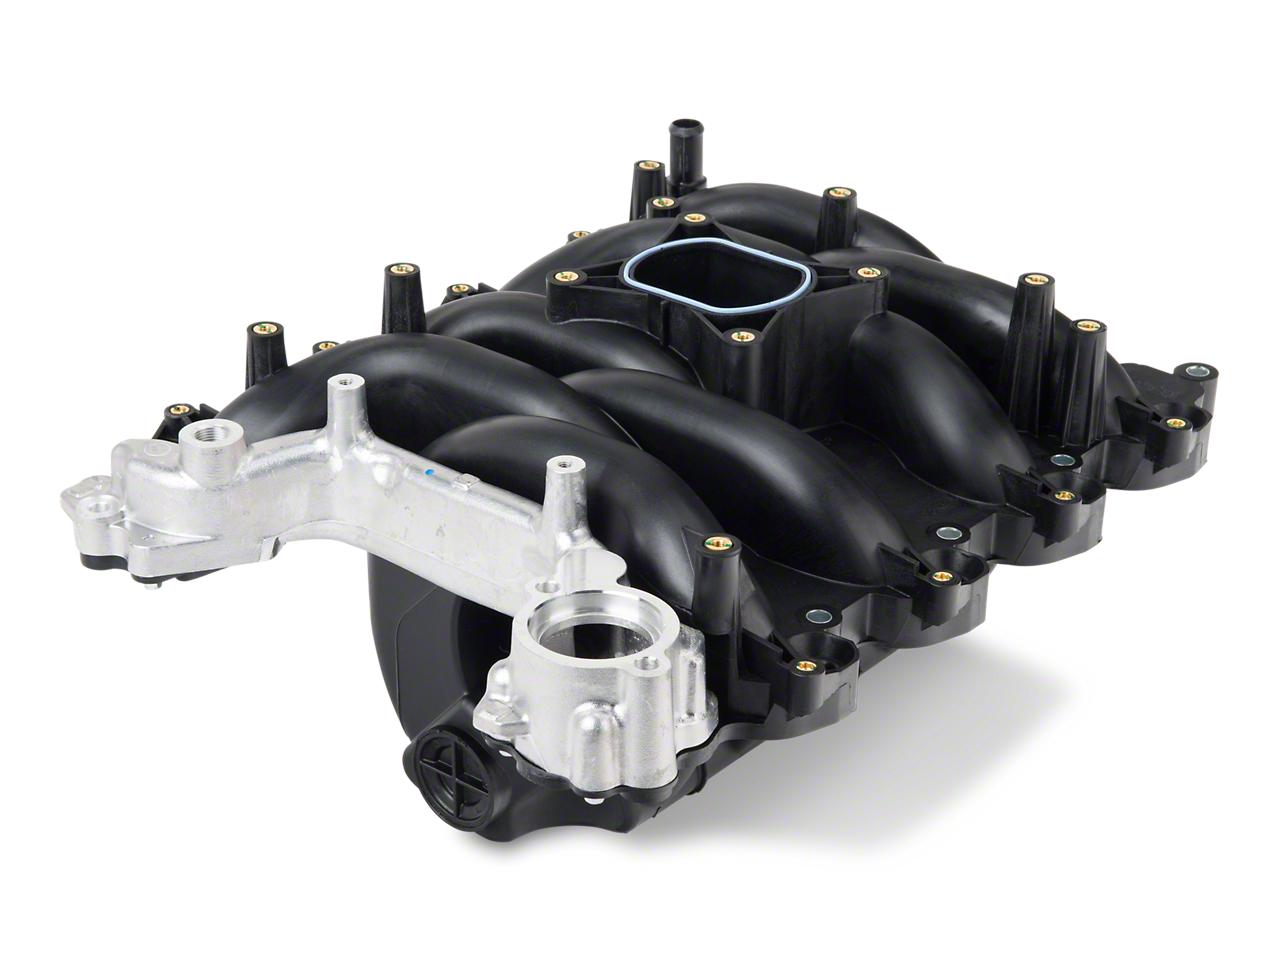 Ford Performance Performance Improvement Intake Manifold (96-04 GT w/ PI Heads)